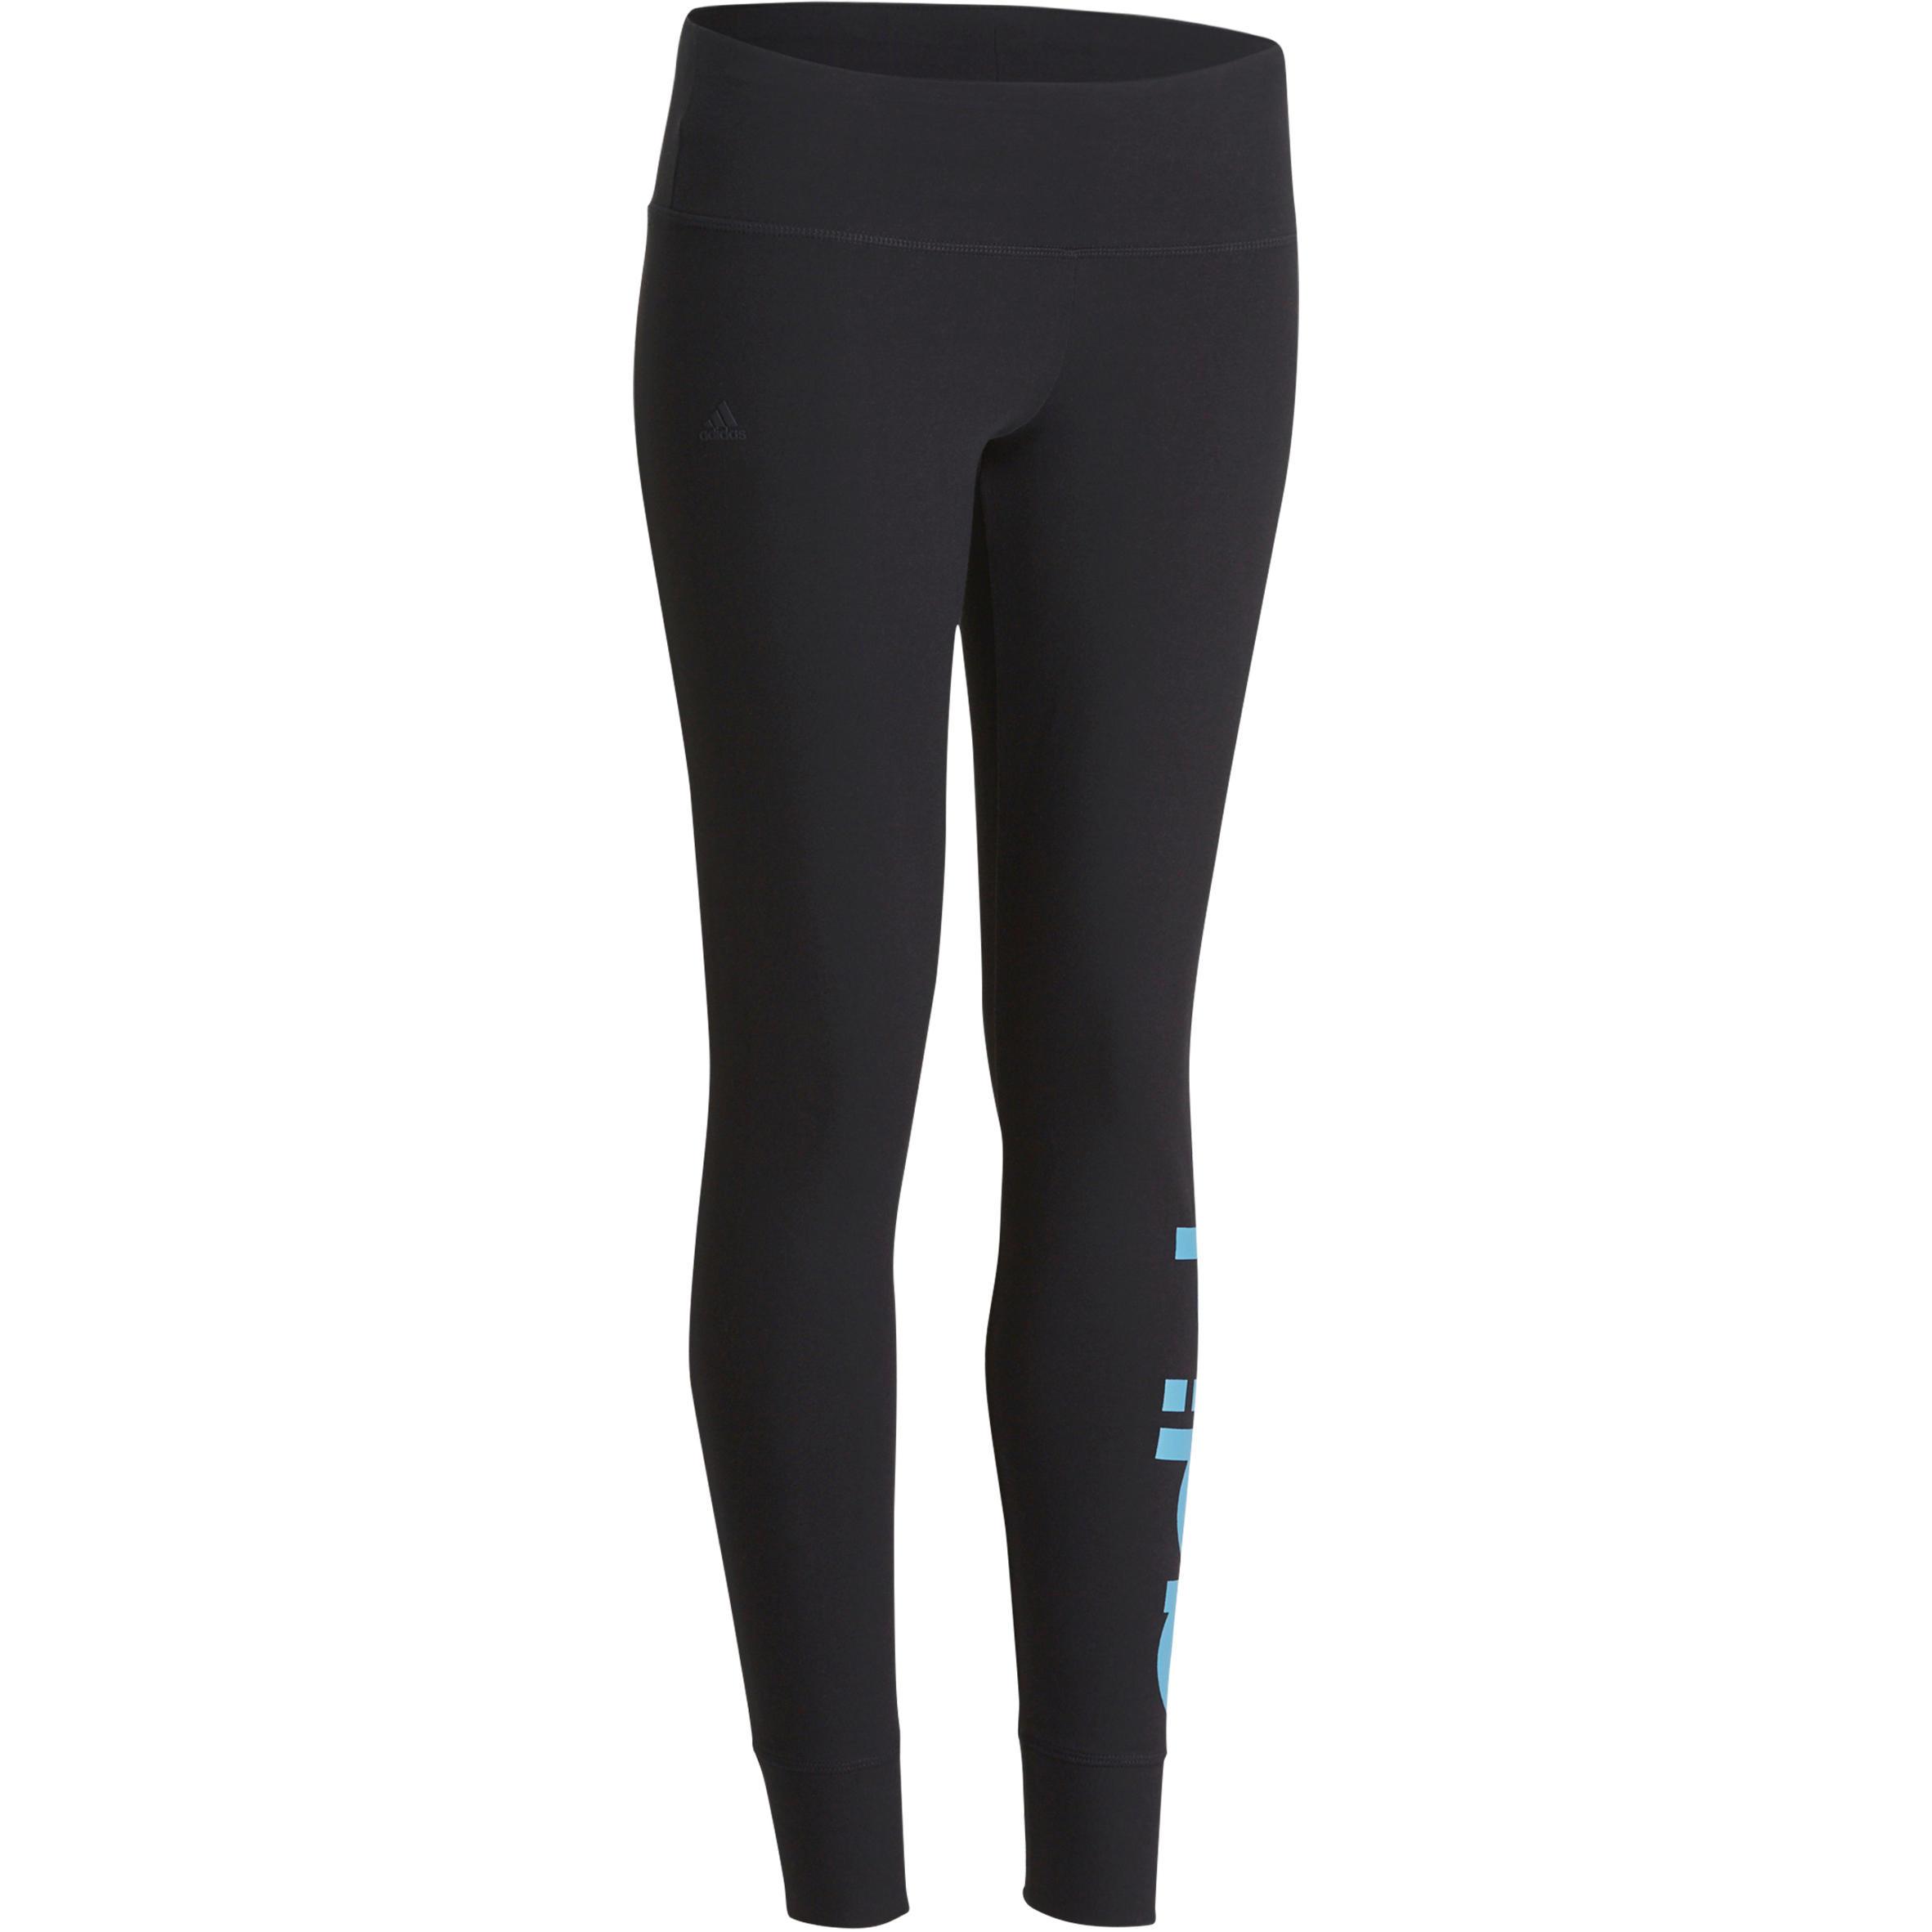 Adidas Fitnesslegging Linear voor dames marineblauw/lichtblauw